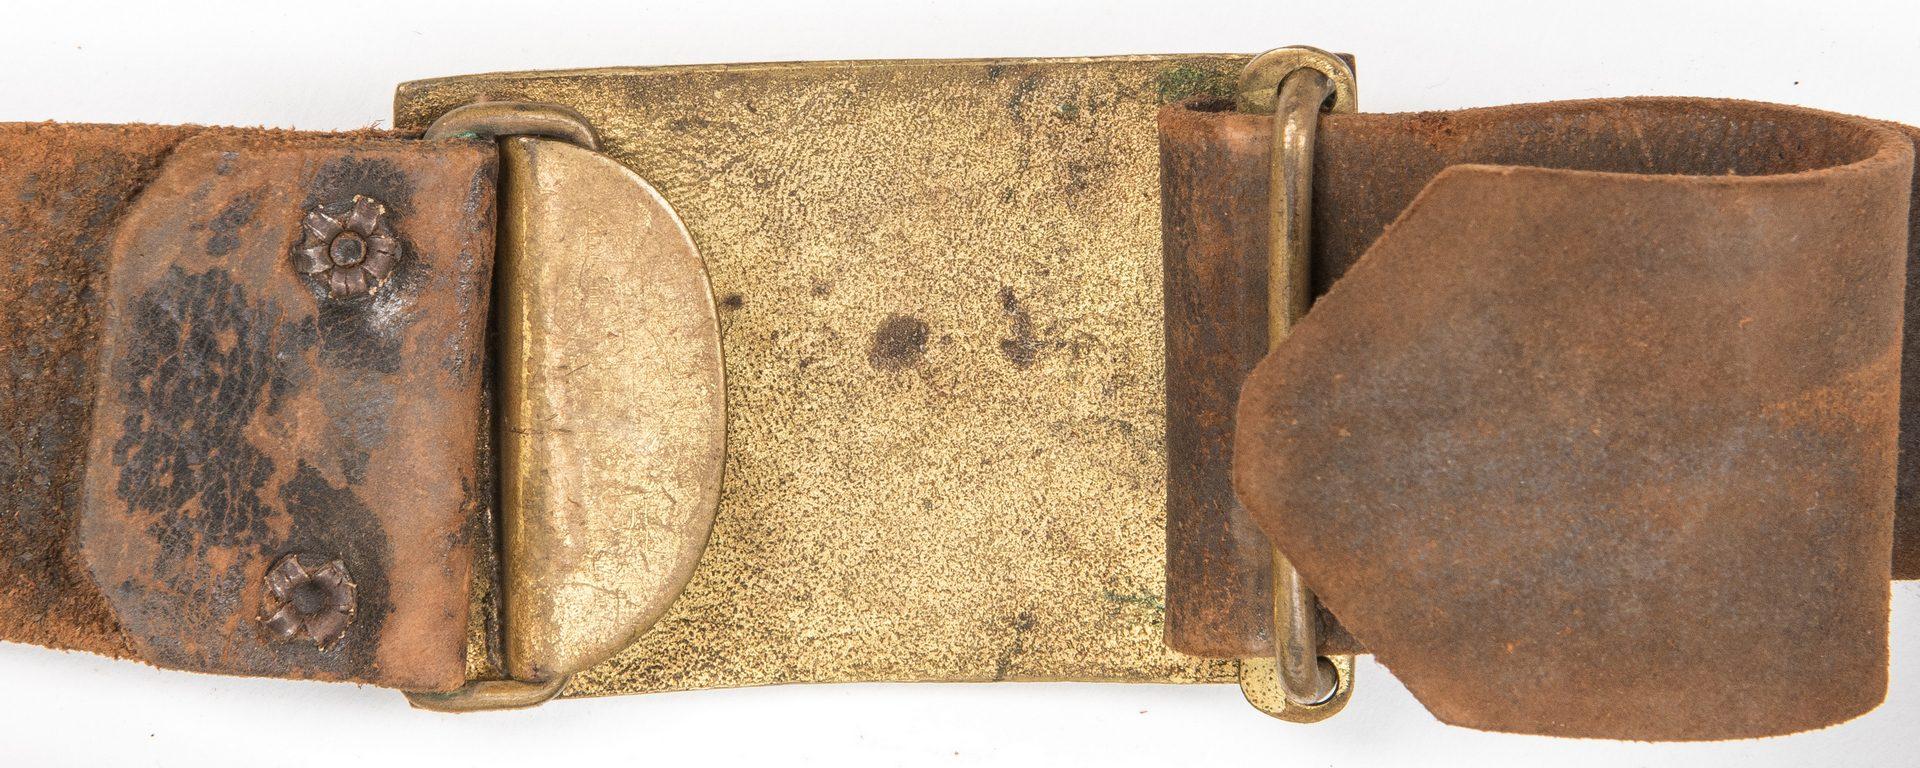 Lot 827: Civil War or Post Indian War Staff Sword, Belt Buckle, 2 items